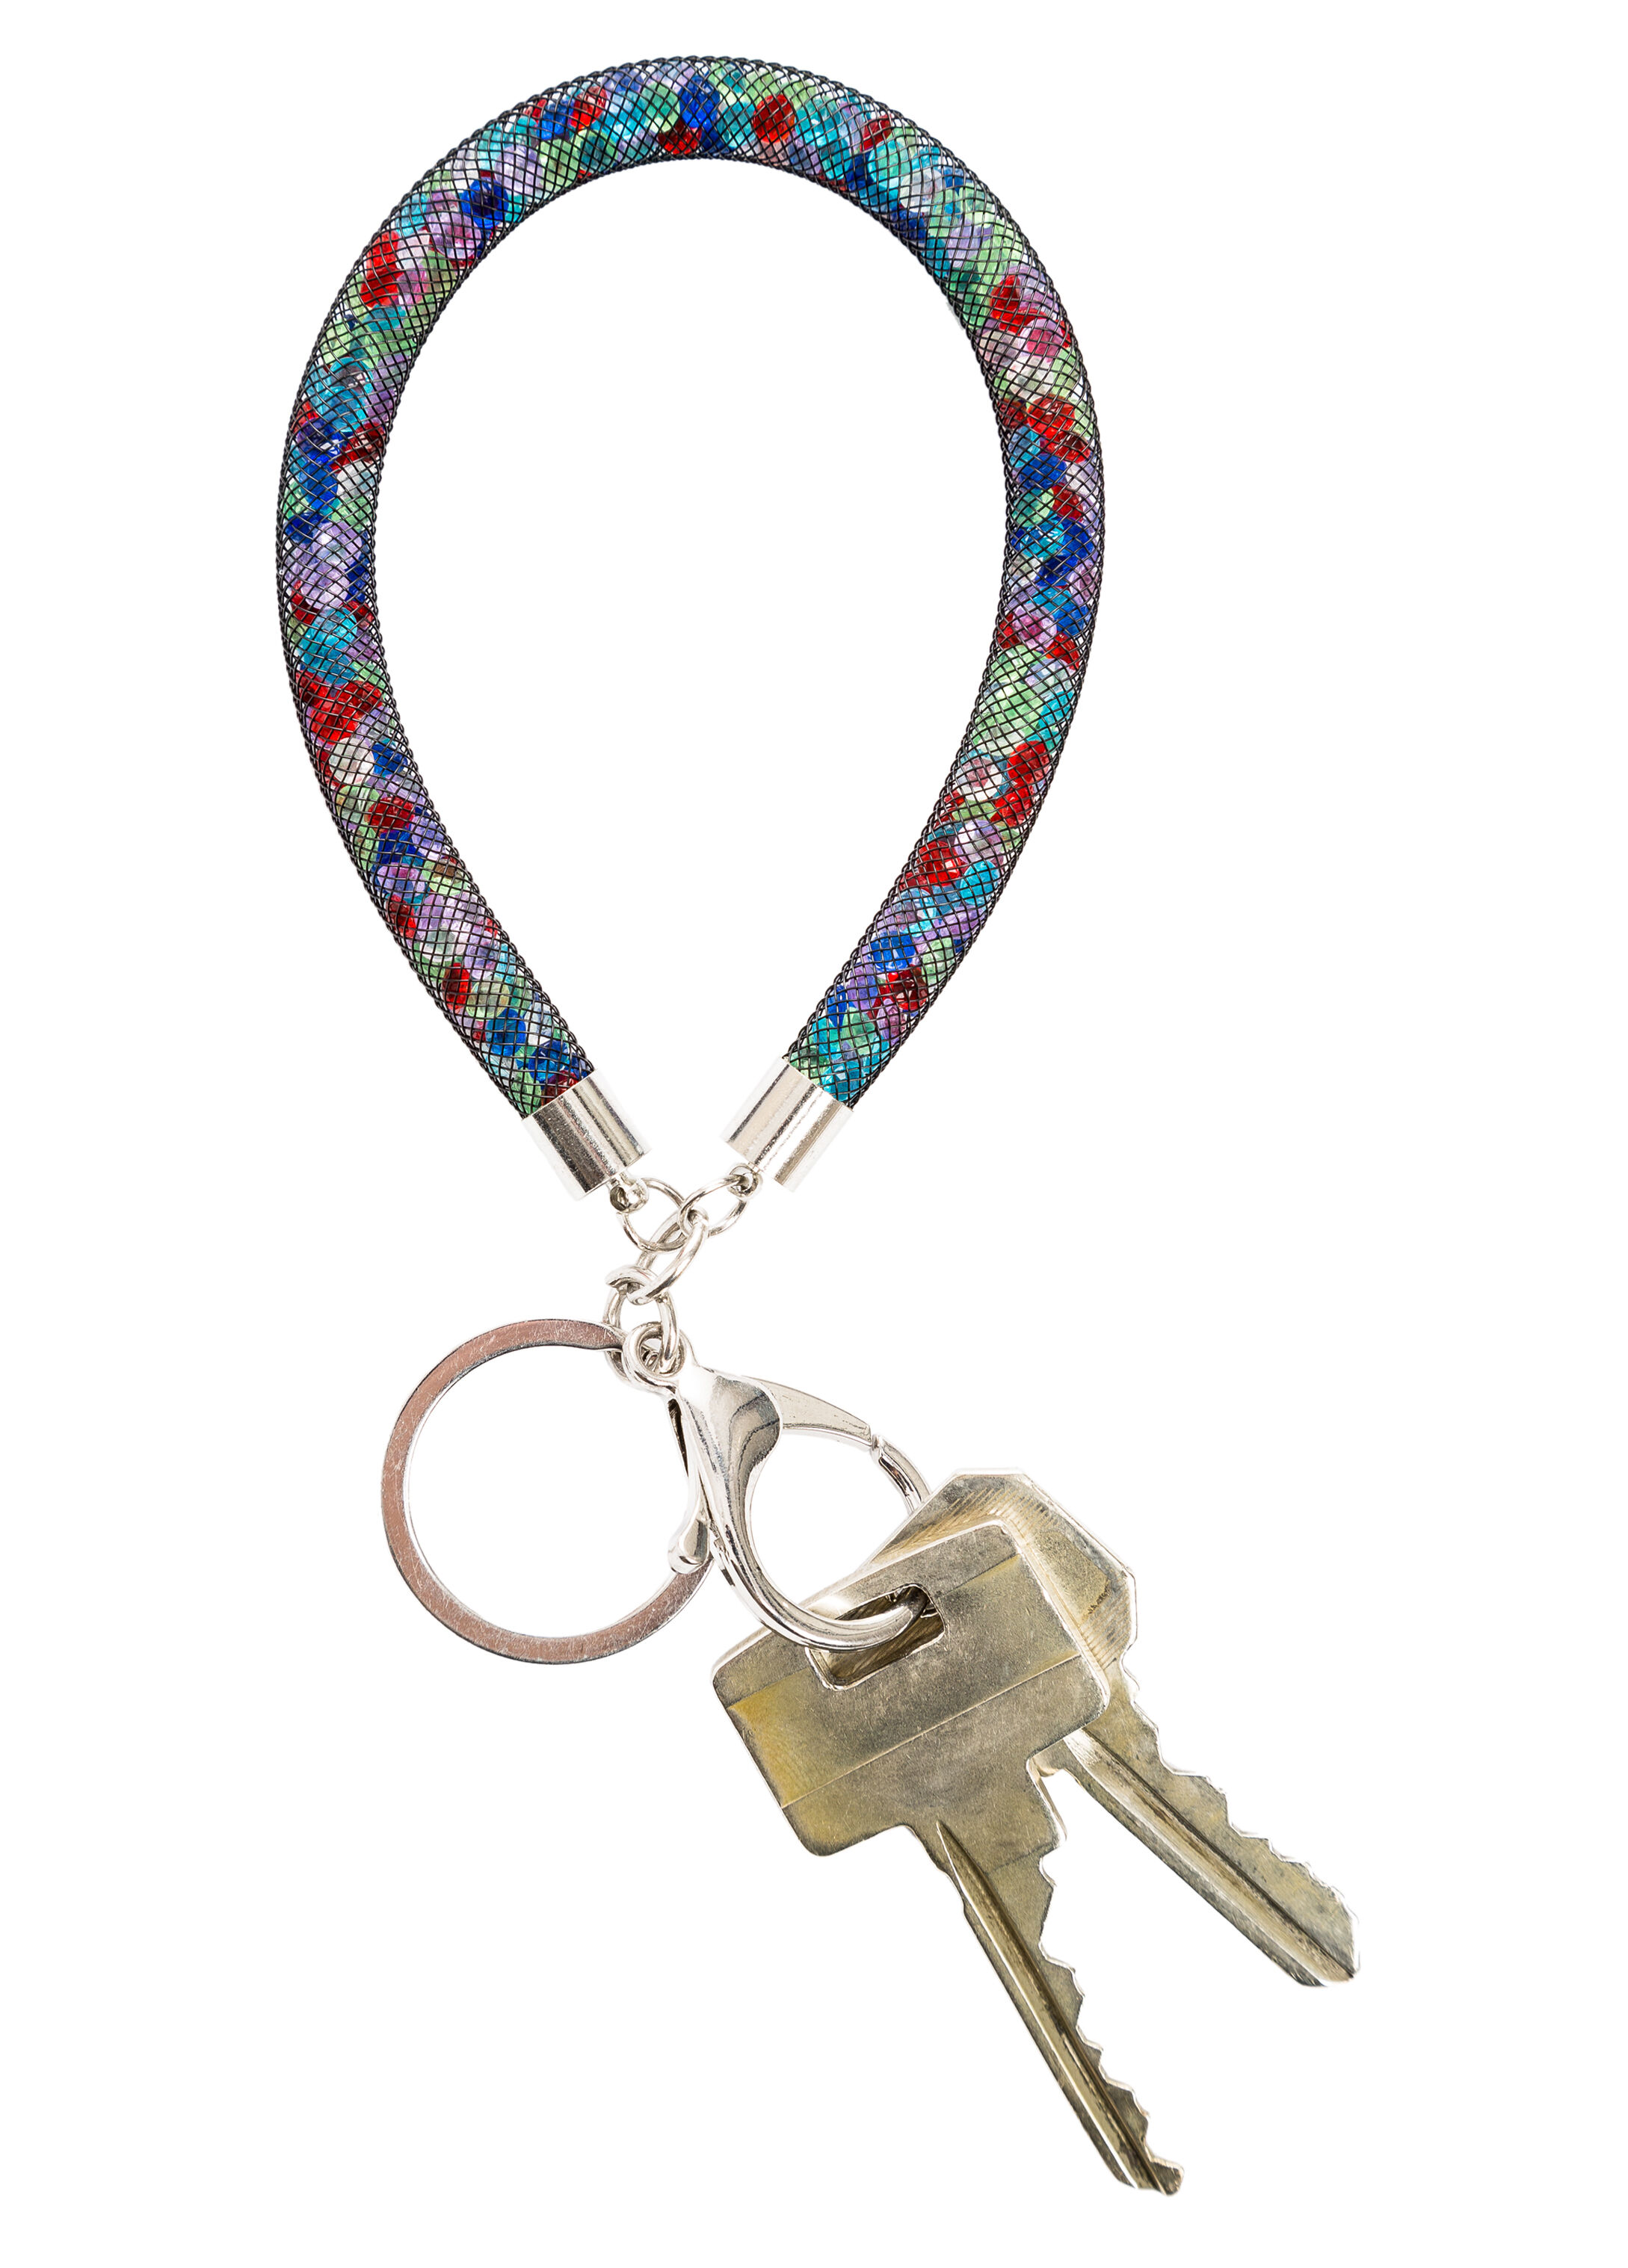 Stone-Filled Mesh Keychain